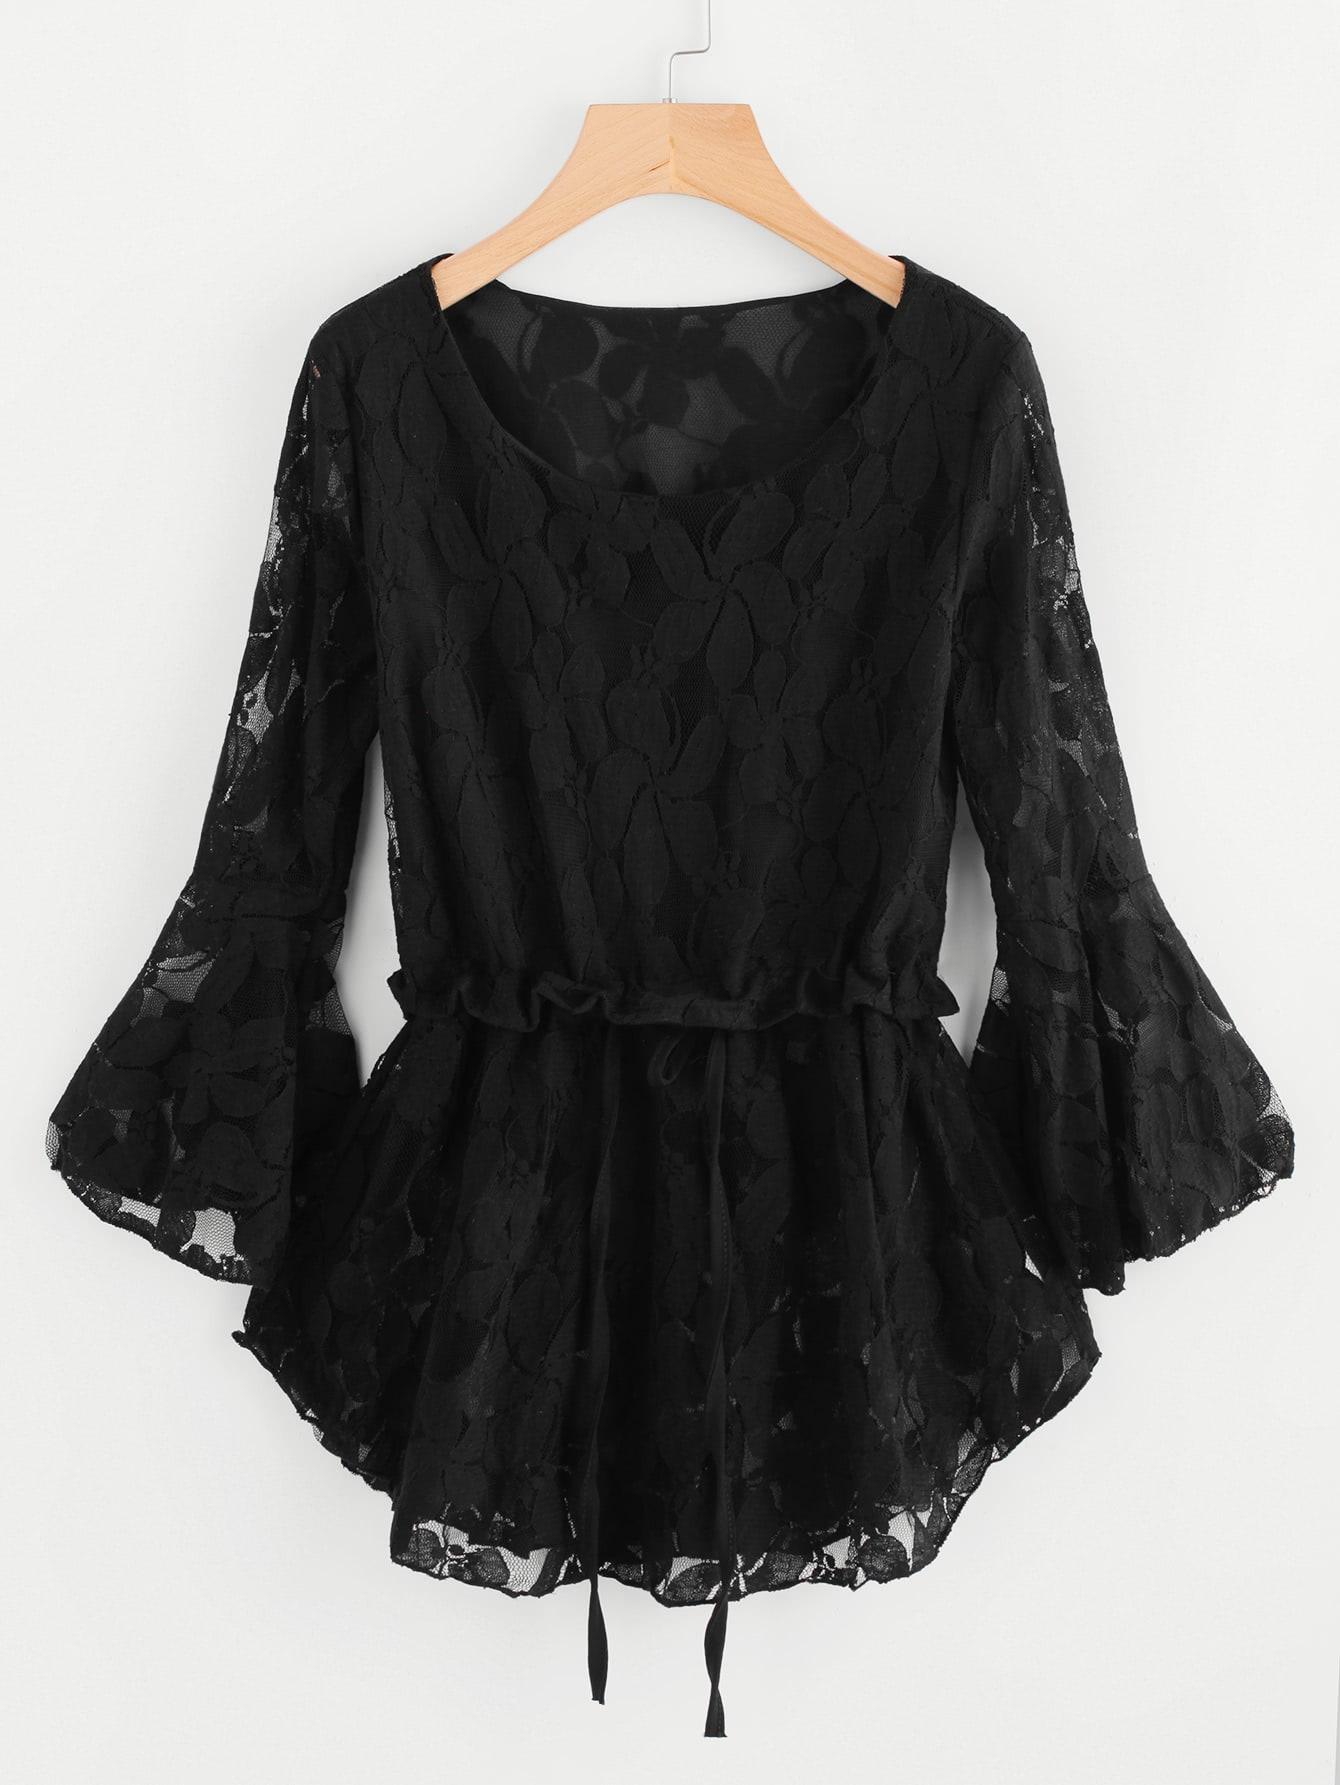 Floral Lace Flute Sleeve Drawstring Pep Hem Blouse tree print drawstring hem hooded blouse